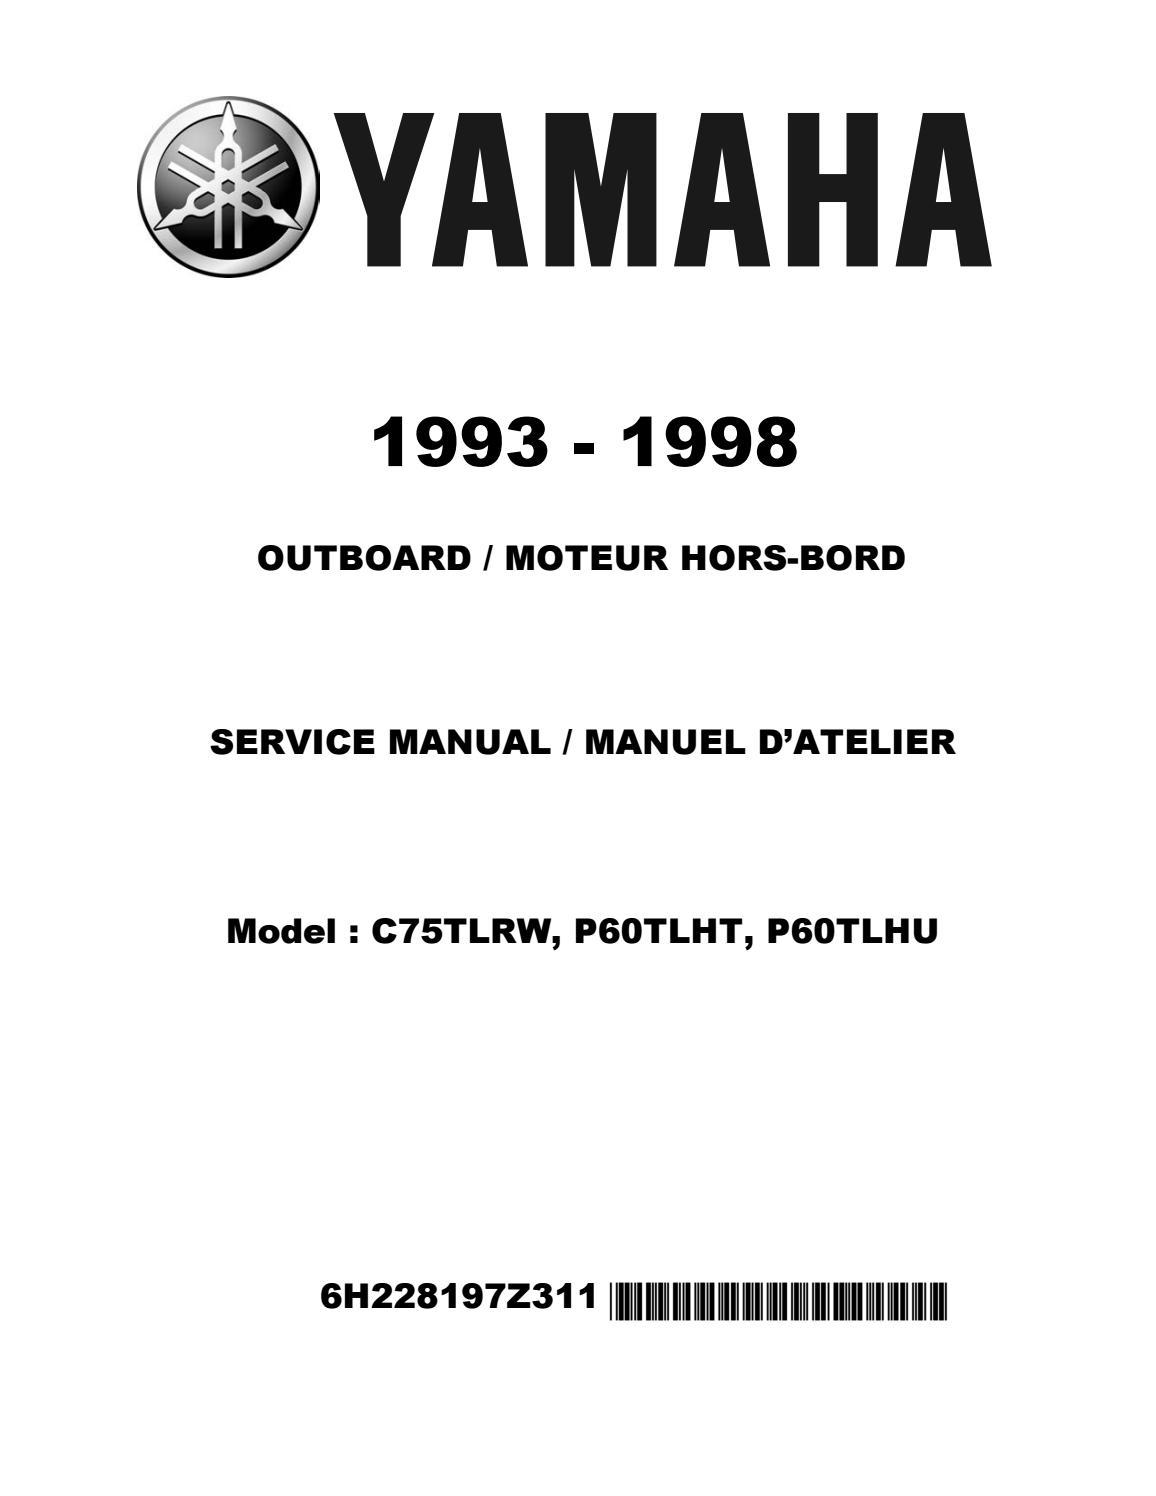 1993-1998 Yamaha 50 60 70 80 90hp 2stroke Outboard Repair